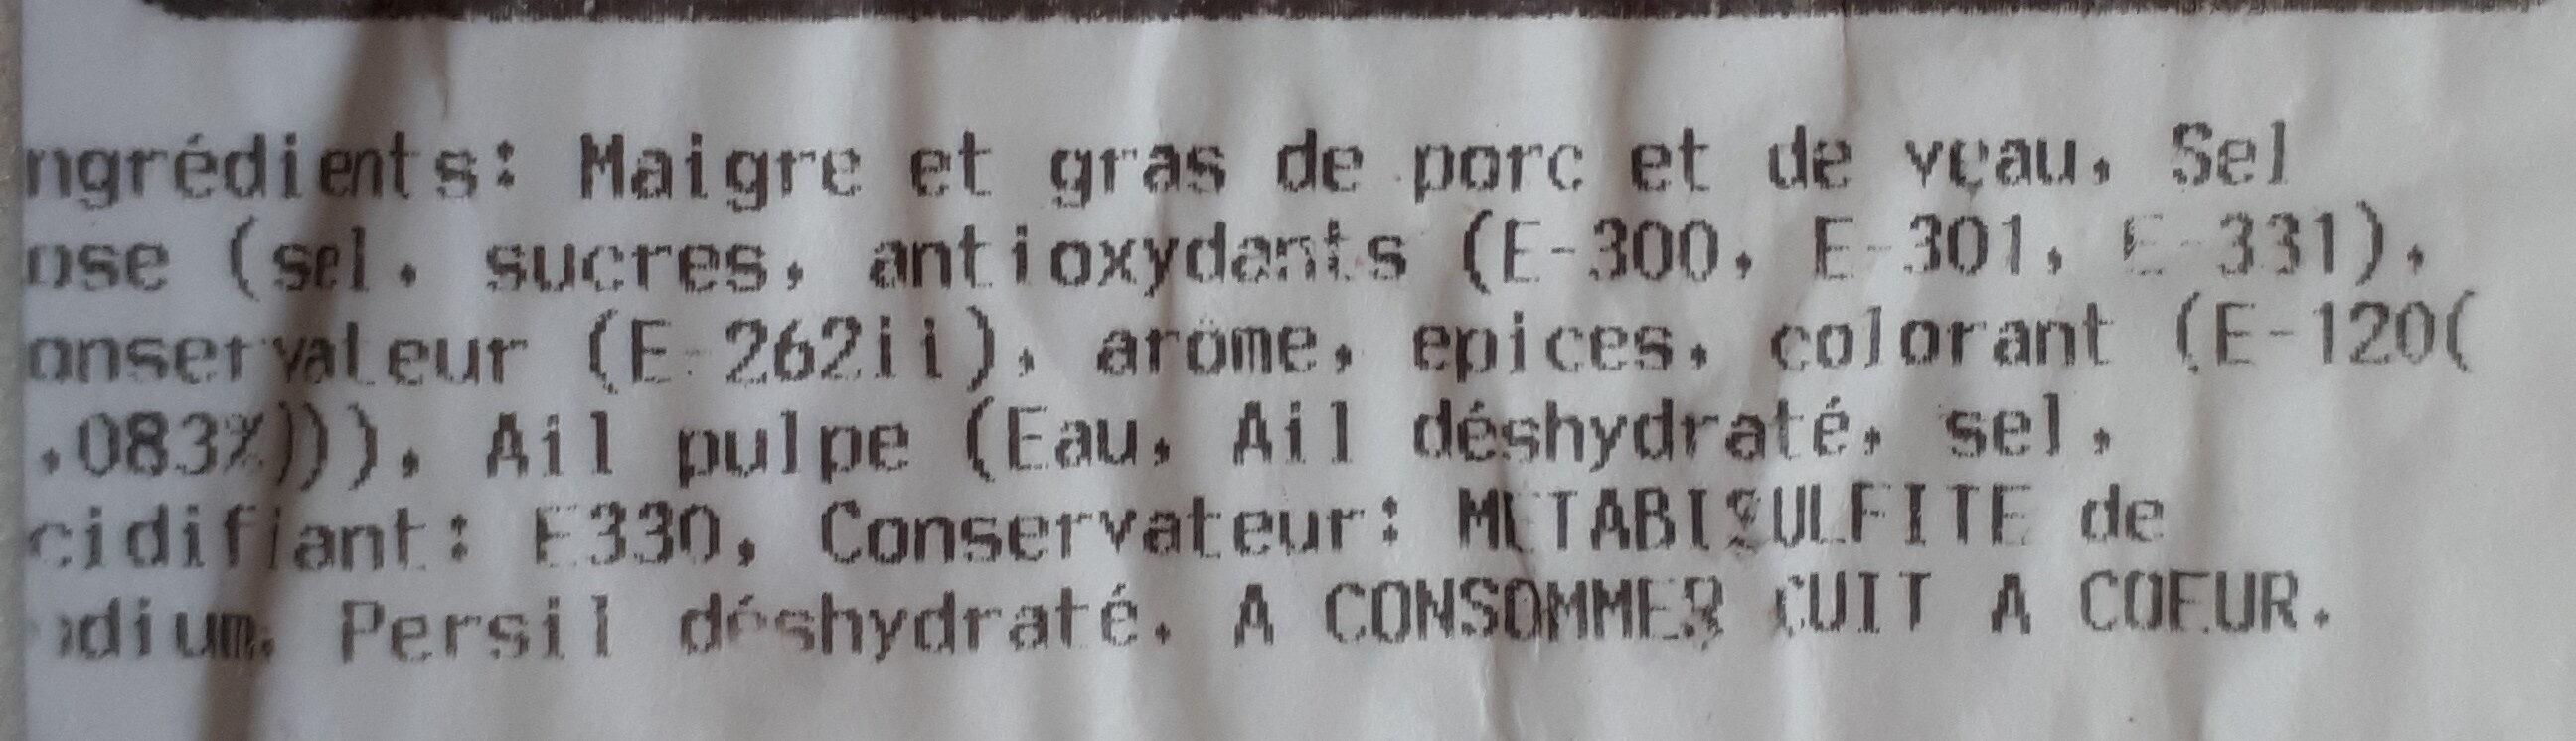 Farce à tomate - Ingredients - fr